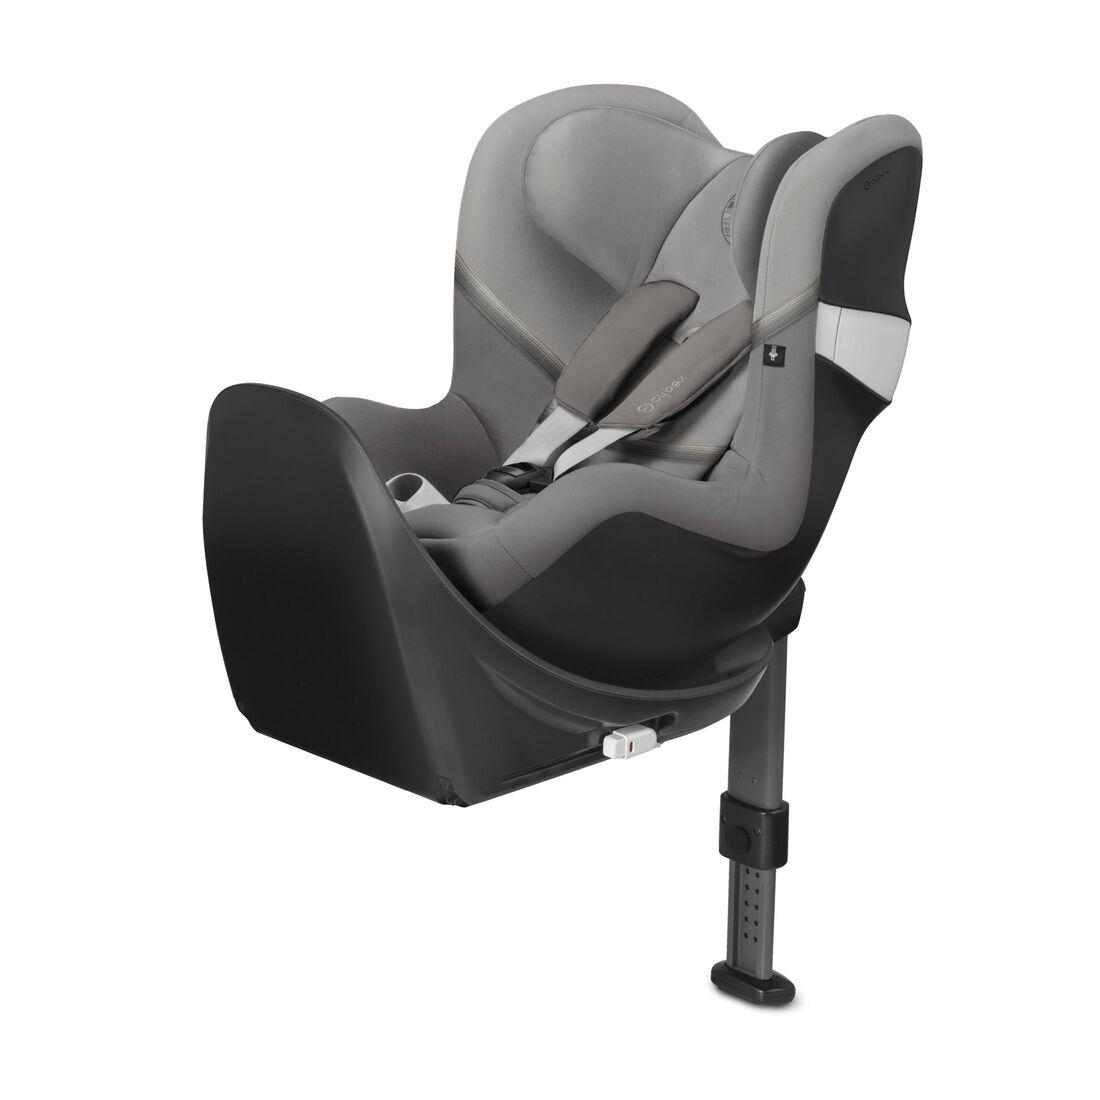 CYBEX Sirona M2 i-Size - Soho Grey in Soho Grey large Bild 2